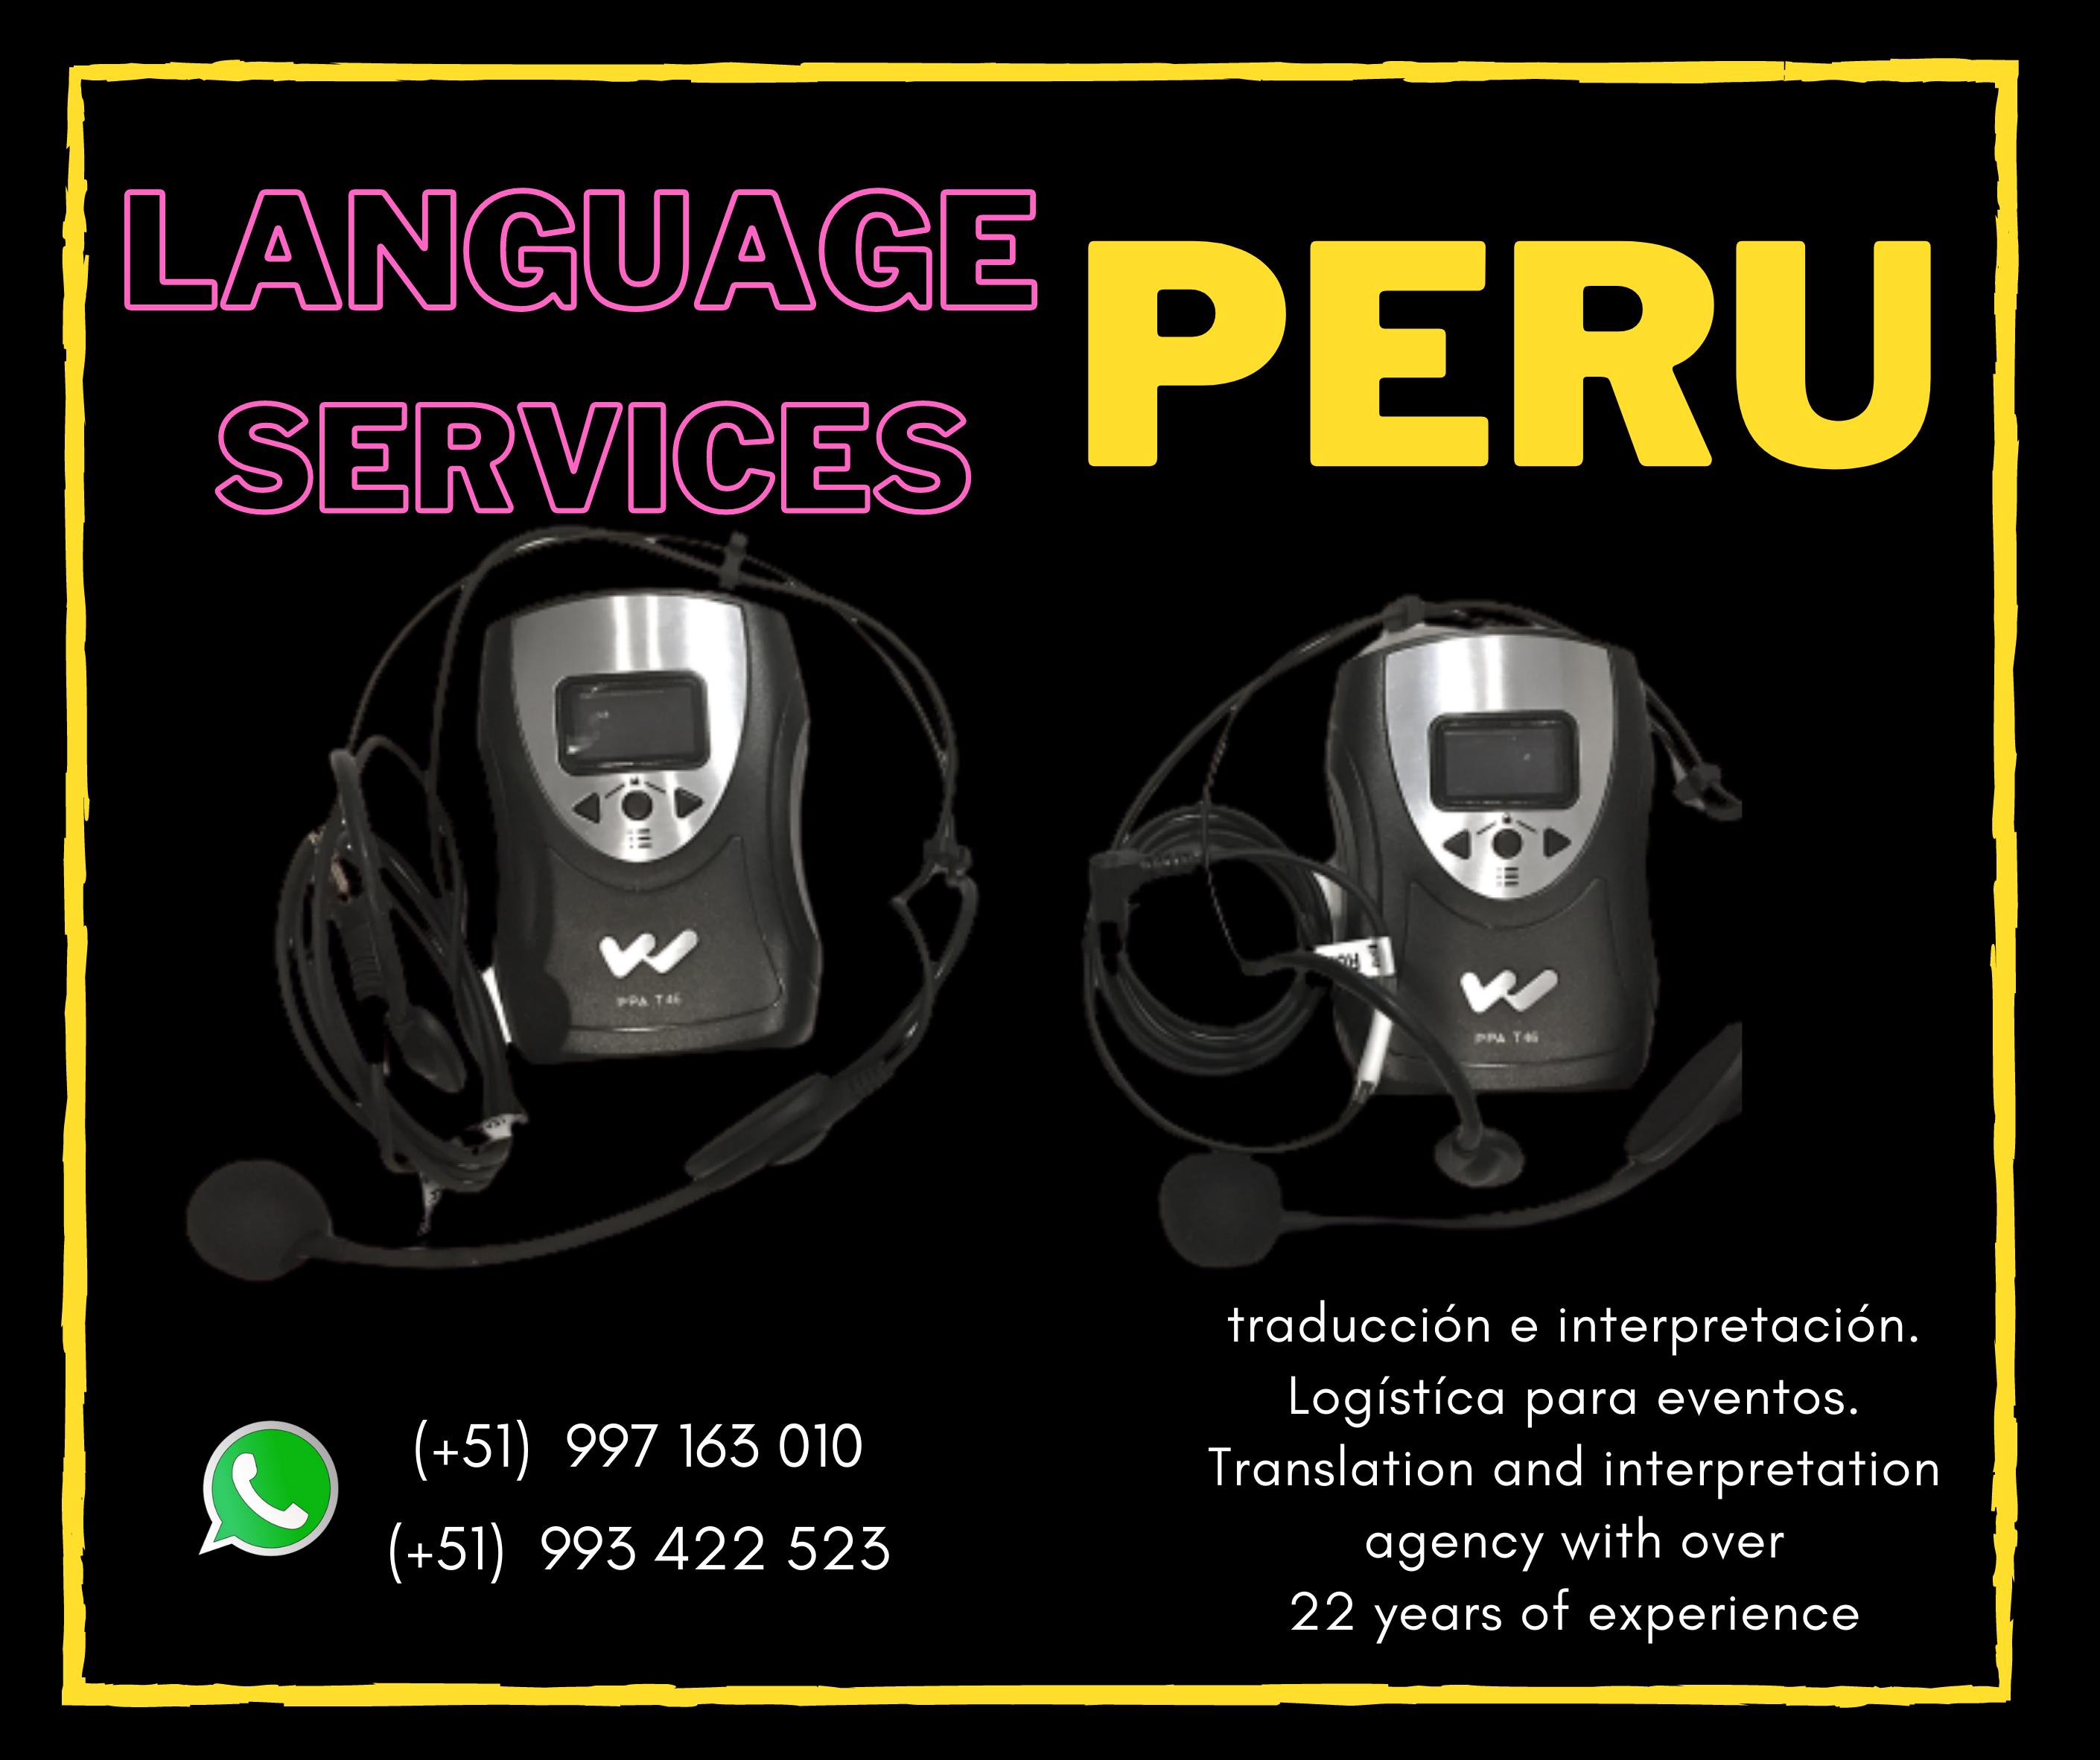 Equipos portátiles visitas guiadas Lima ✅ 997163010